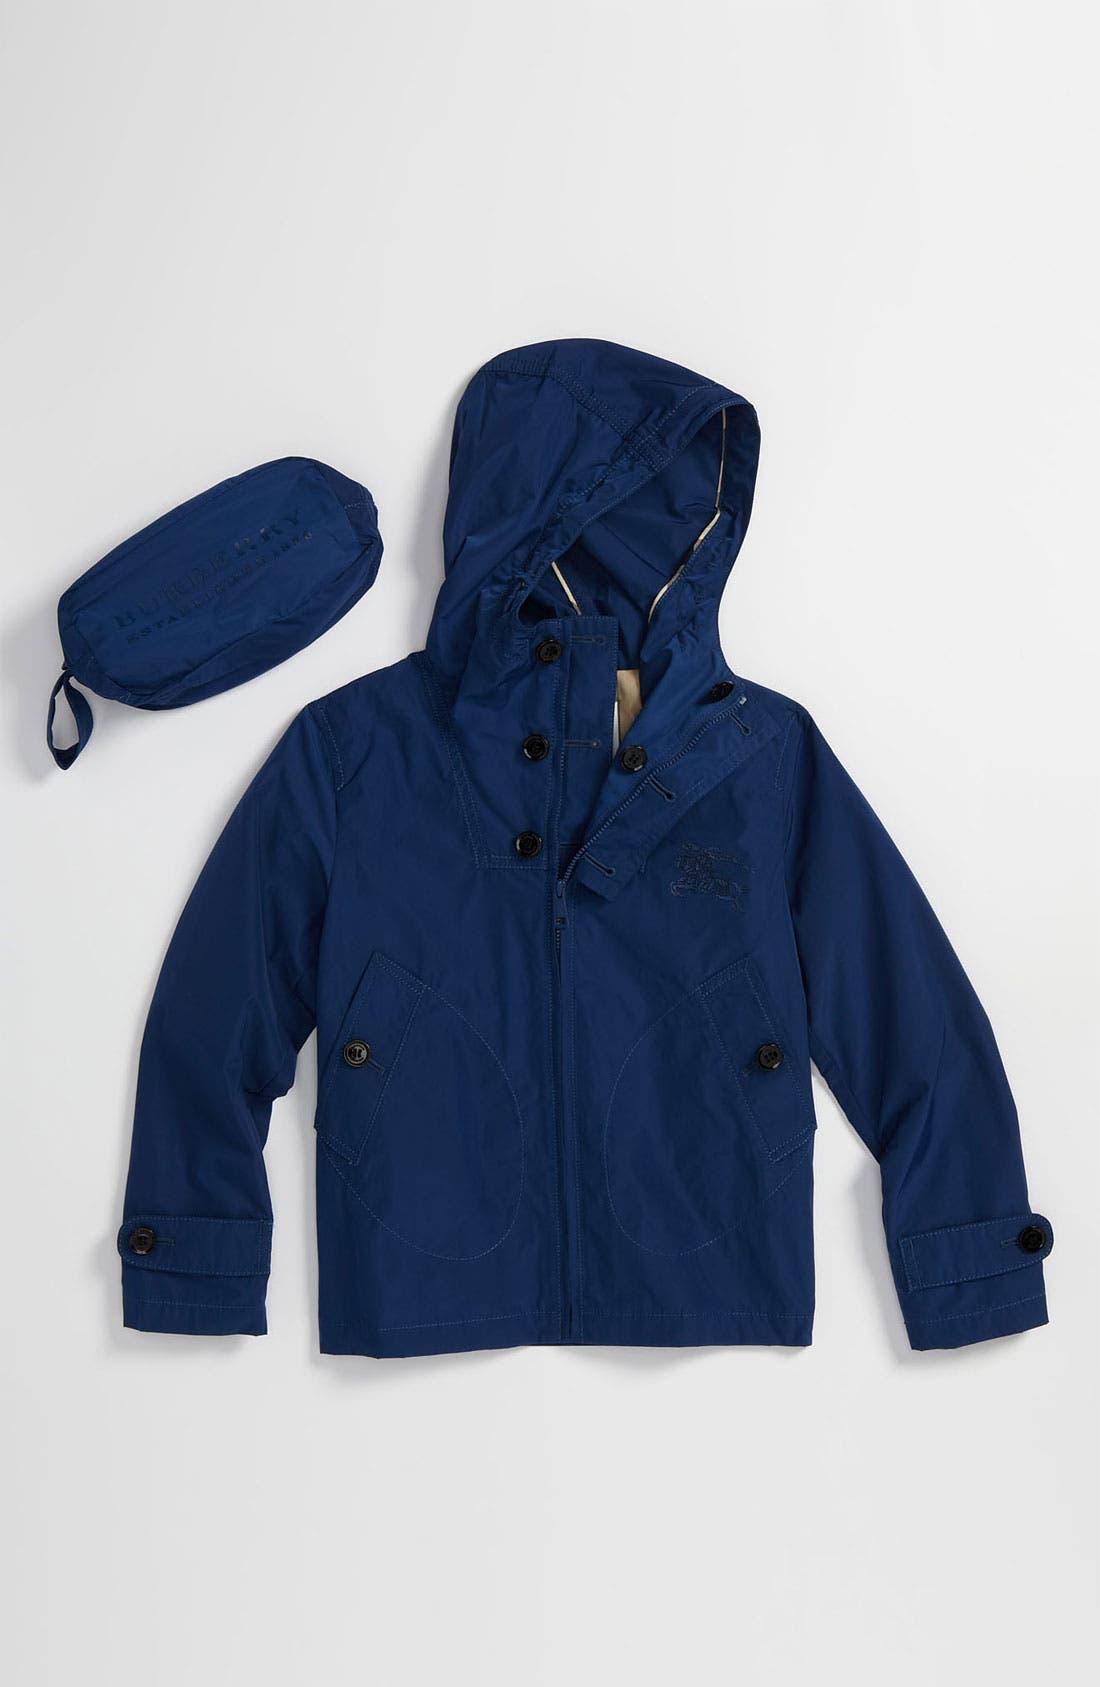 Alternate Image 1 Selected - Burberry Packable Jacket (Little Boys & Big Boys)